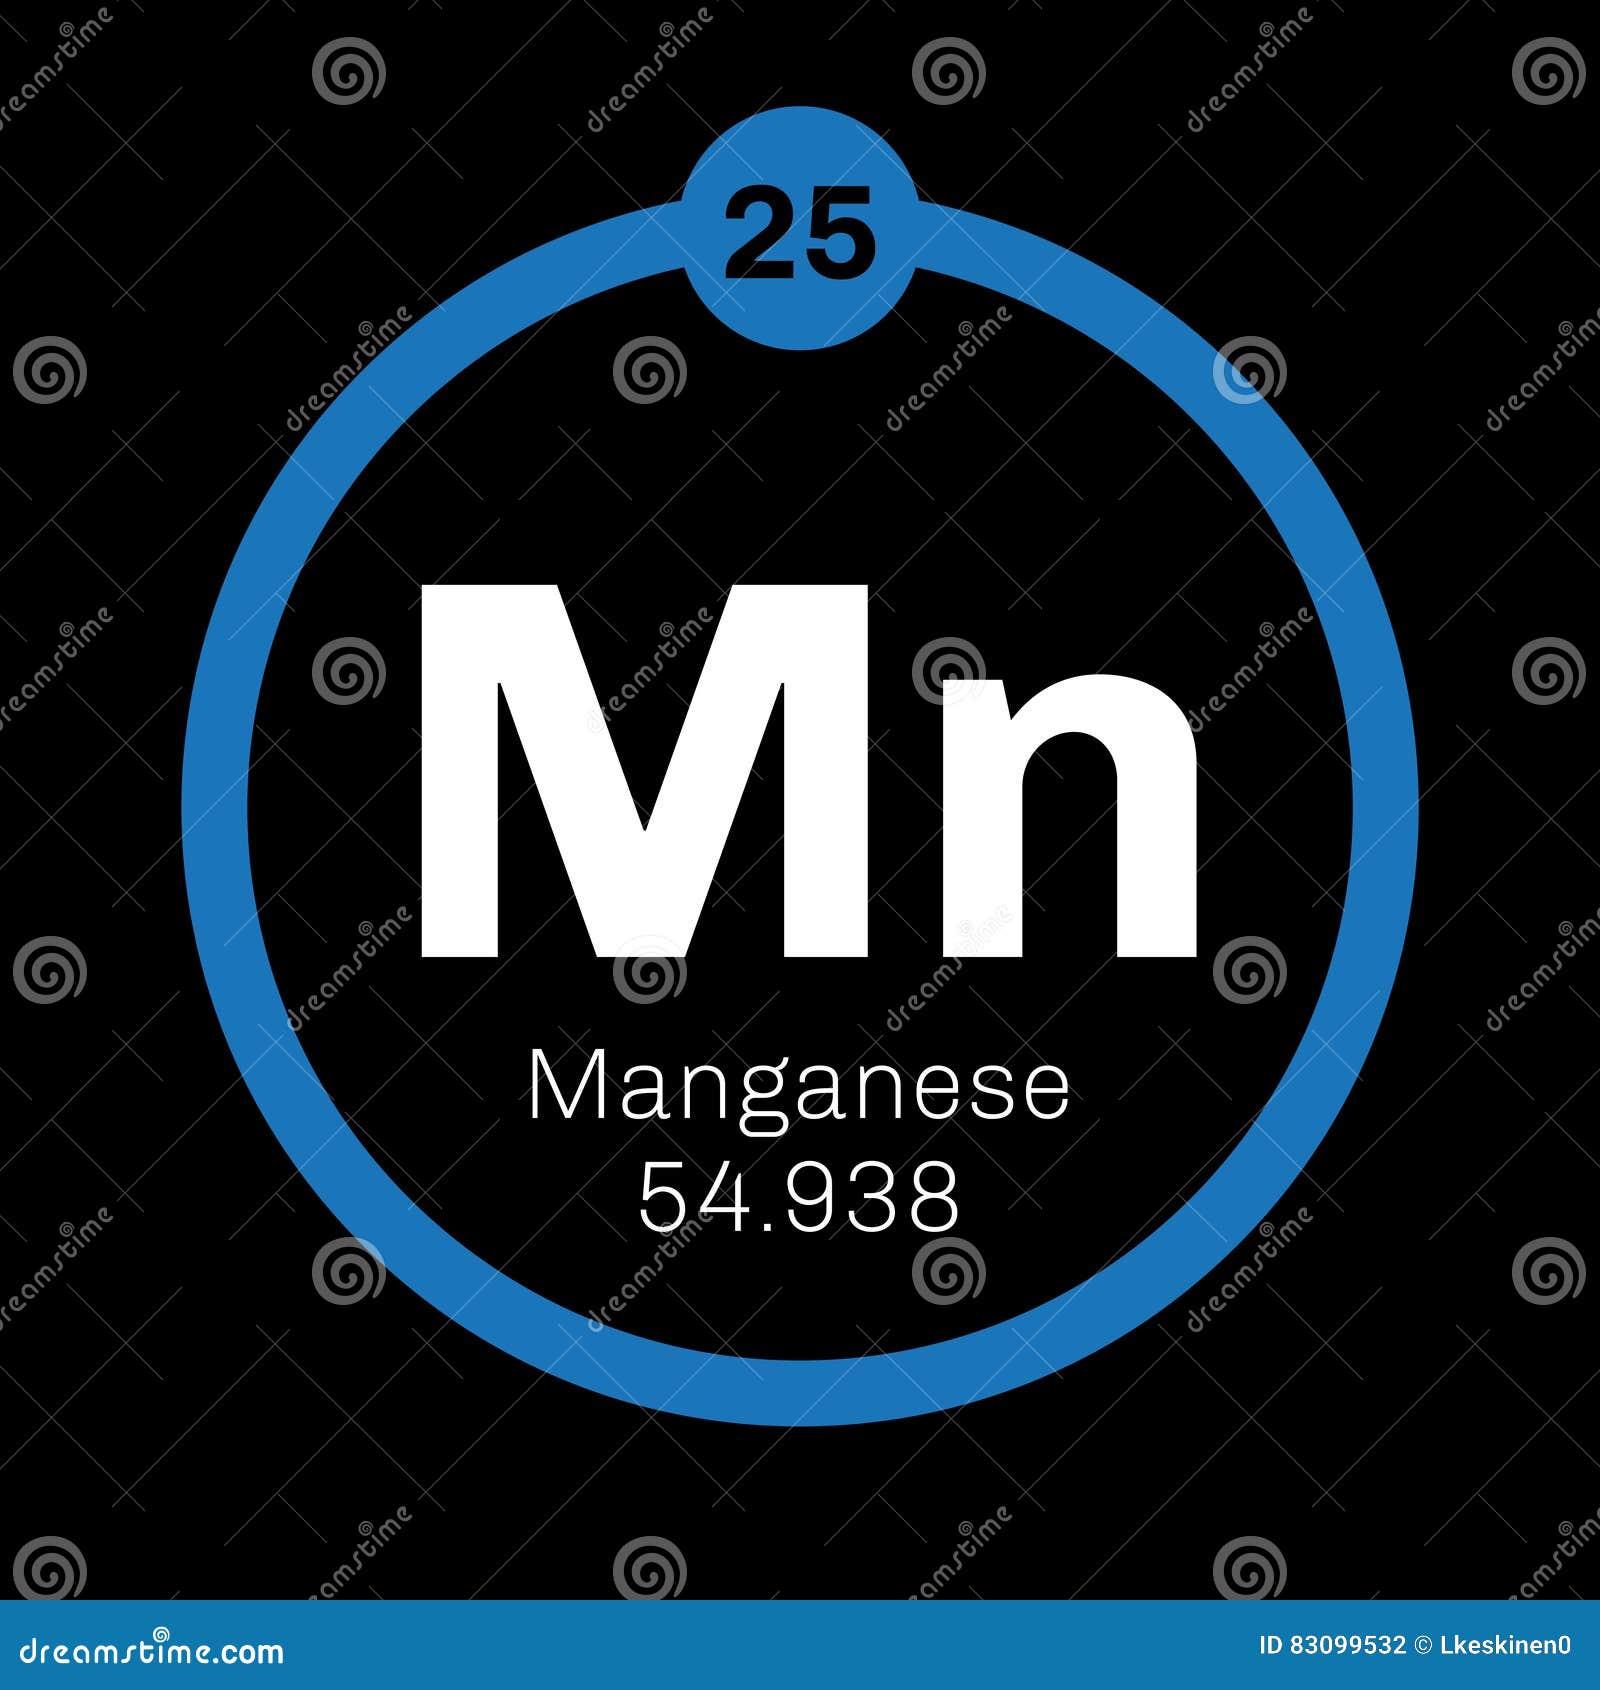 Manganese chemical element stock vector illustration of atom 83099532 manganese chemical element atom electrons urtaz Gallery